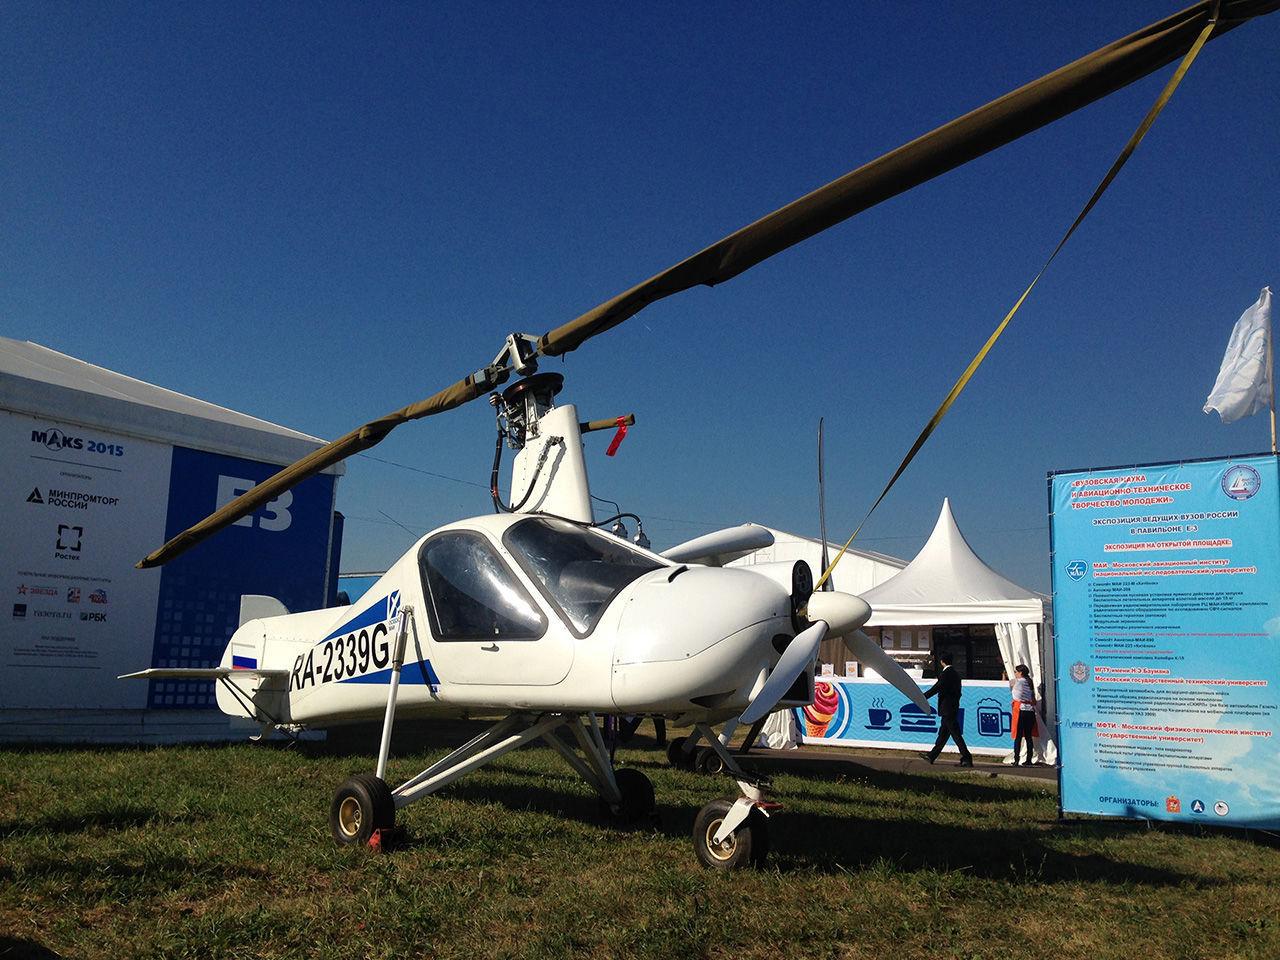 Autogyro MAI-208